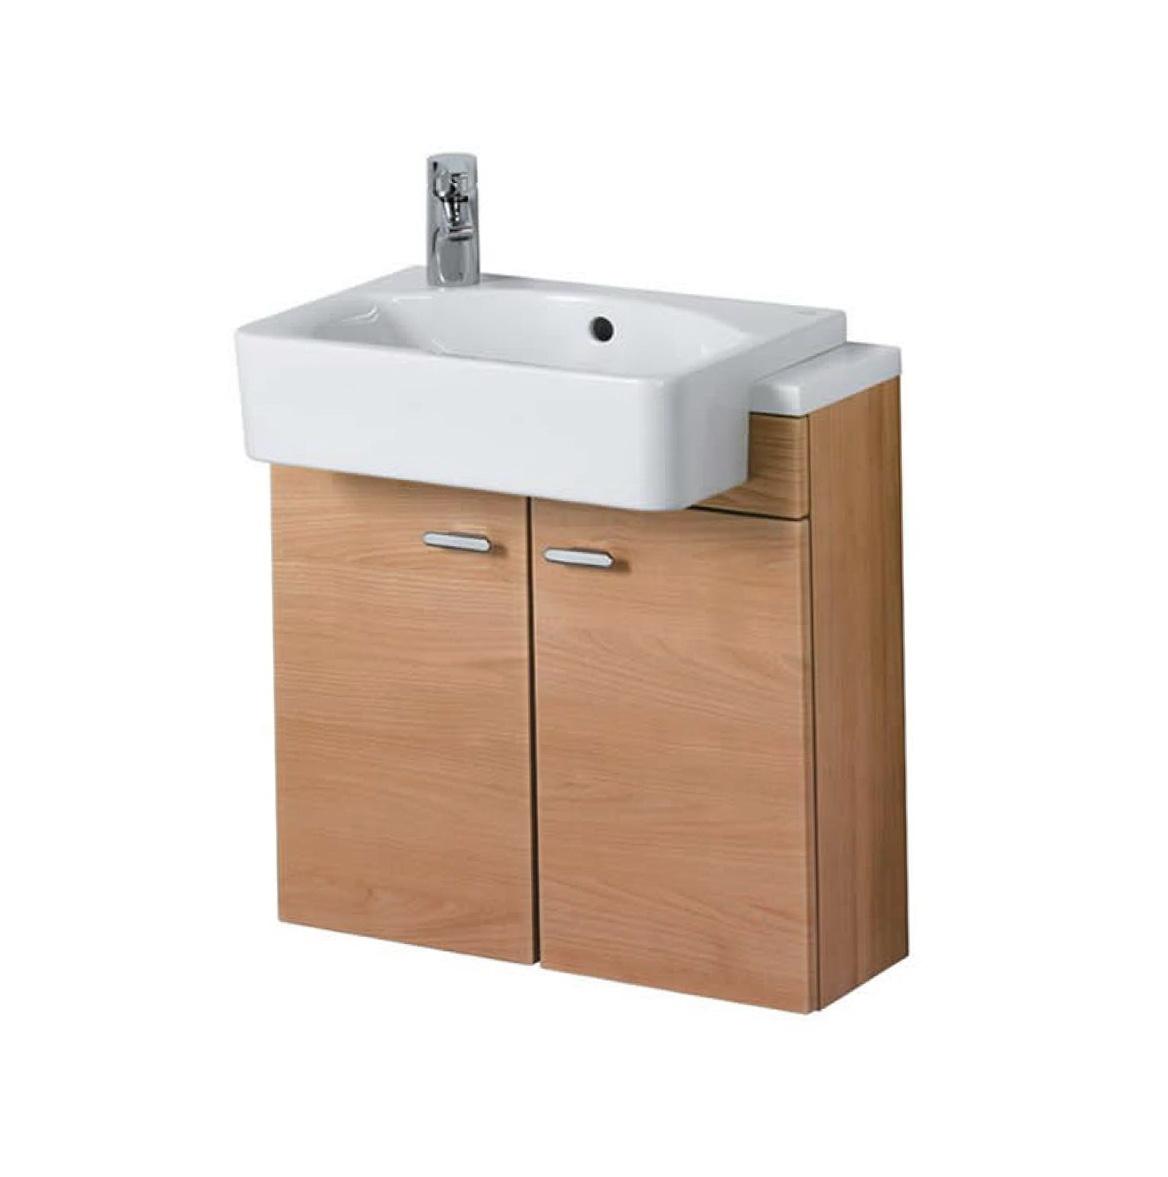 Bathroom Vanity Units For Countertop Basins